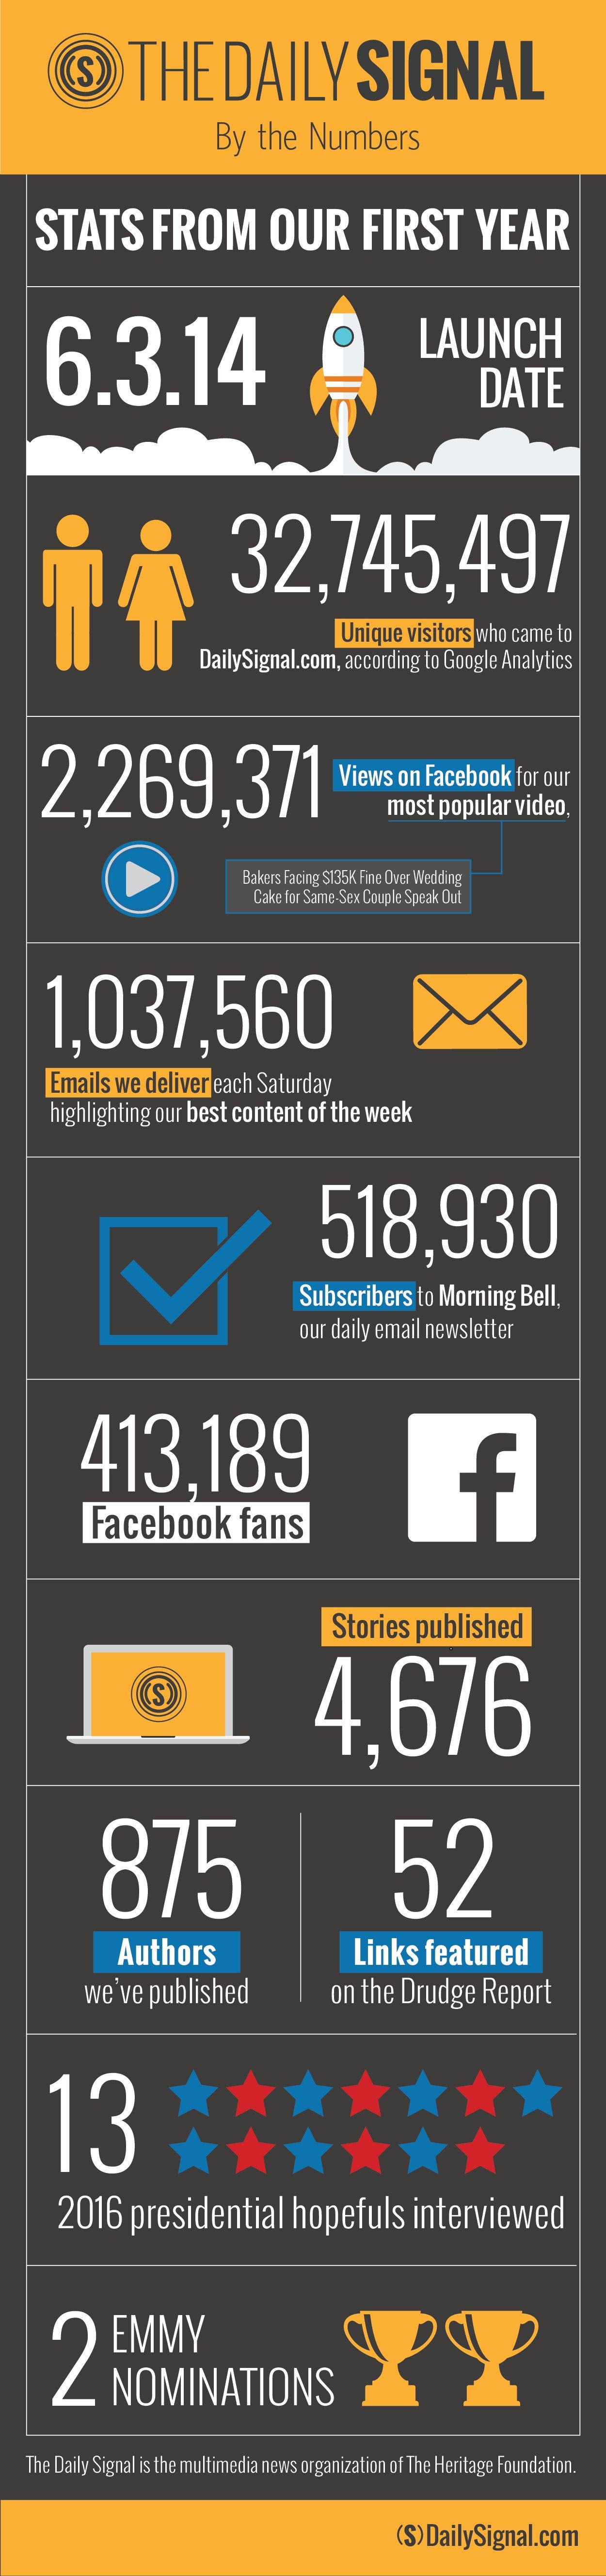 TDS Anniversary Infographic-01